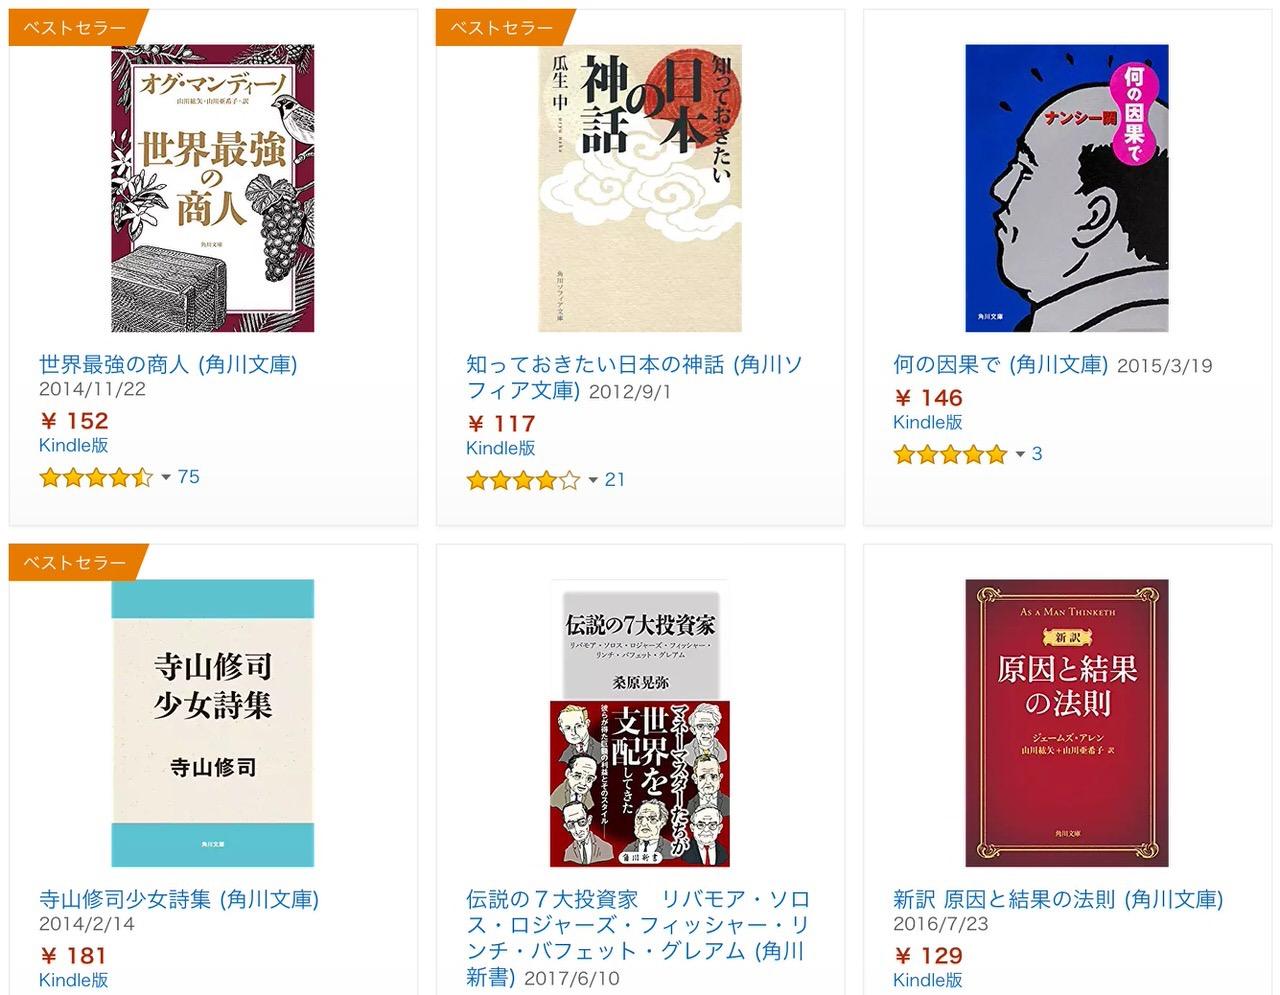 【Kindleセール】75%OFF「KADOKAWA Kindle限定75%OFFセール」(10/30まで)